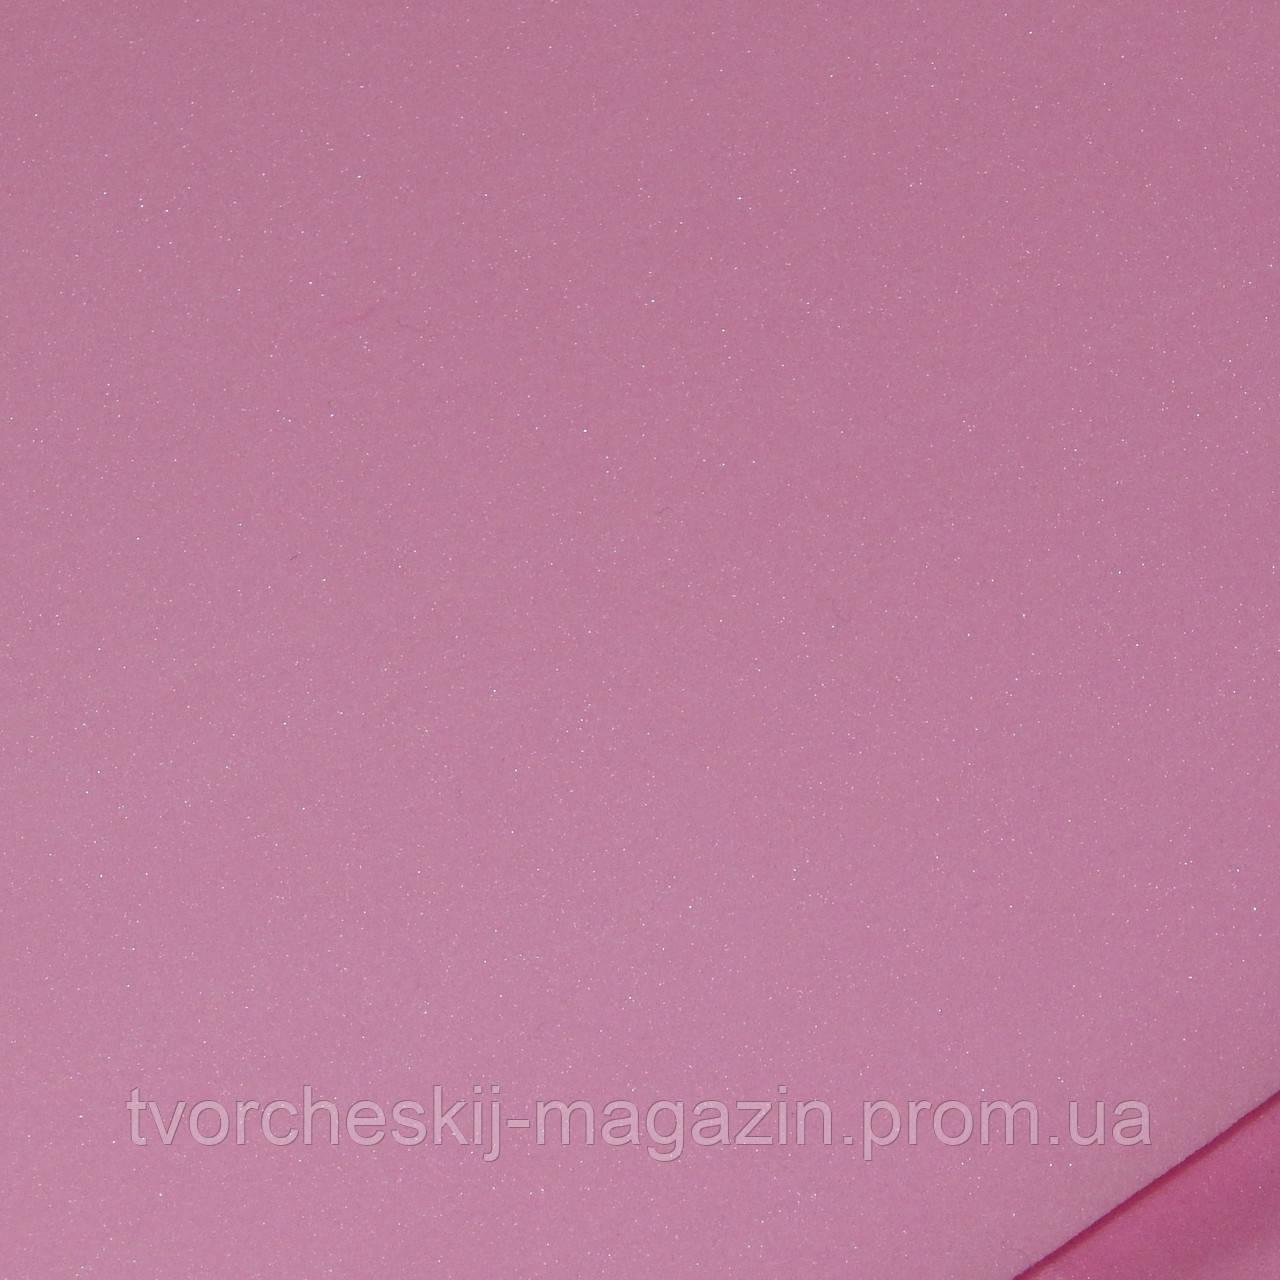 Фоамиран 0,8 мм 30 х 20 см розовый А4